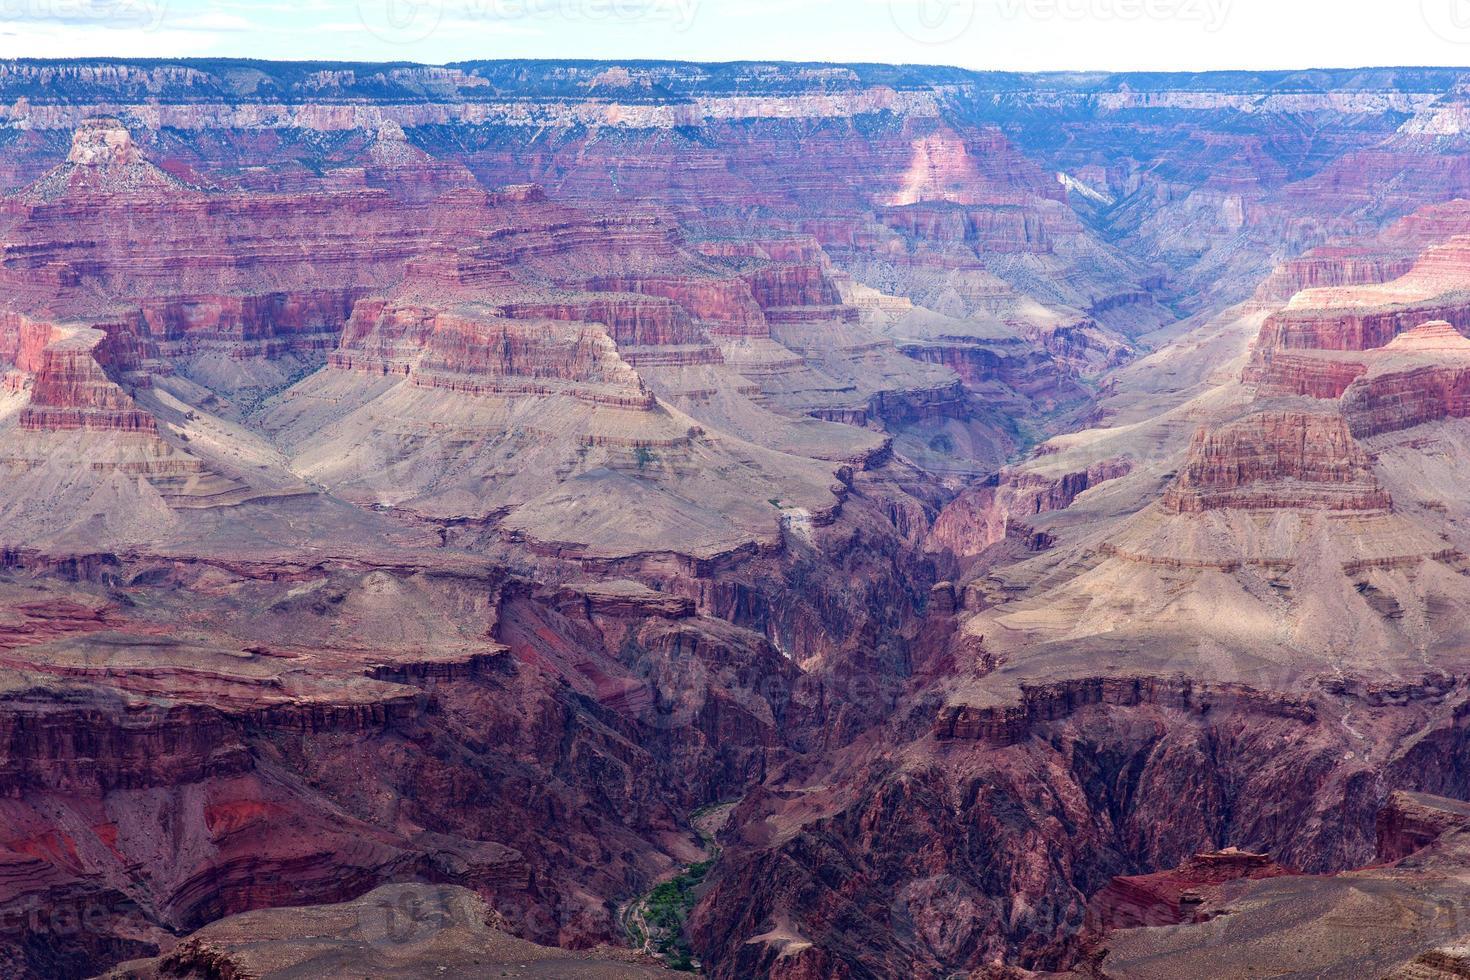 Parque Nacional do Grand Canyon foto